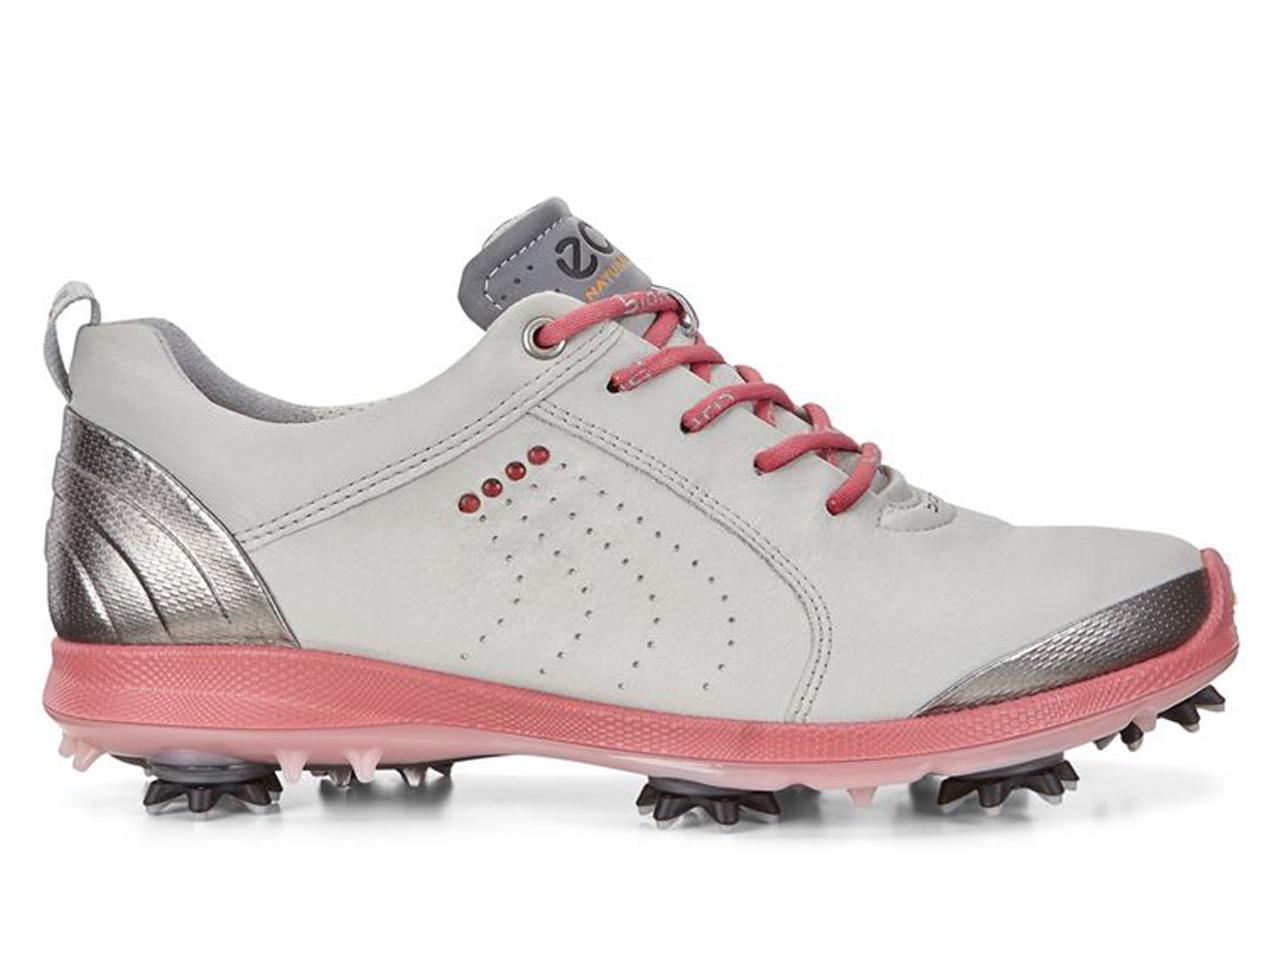 30994413 Ecco Ladies Biom G2 Golf Shoes - Concrete/Pink